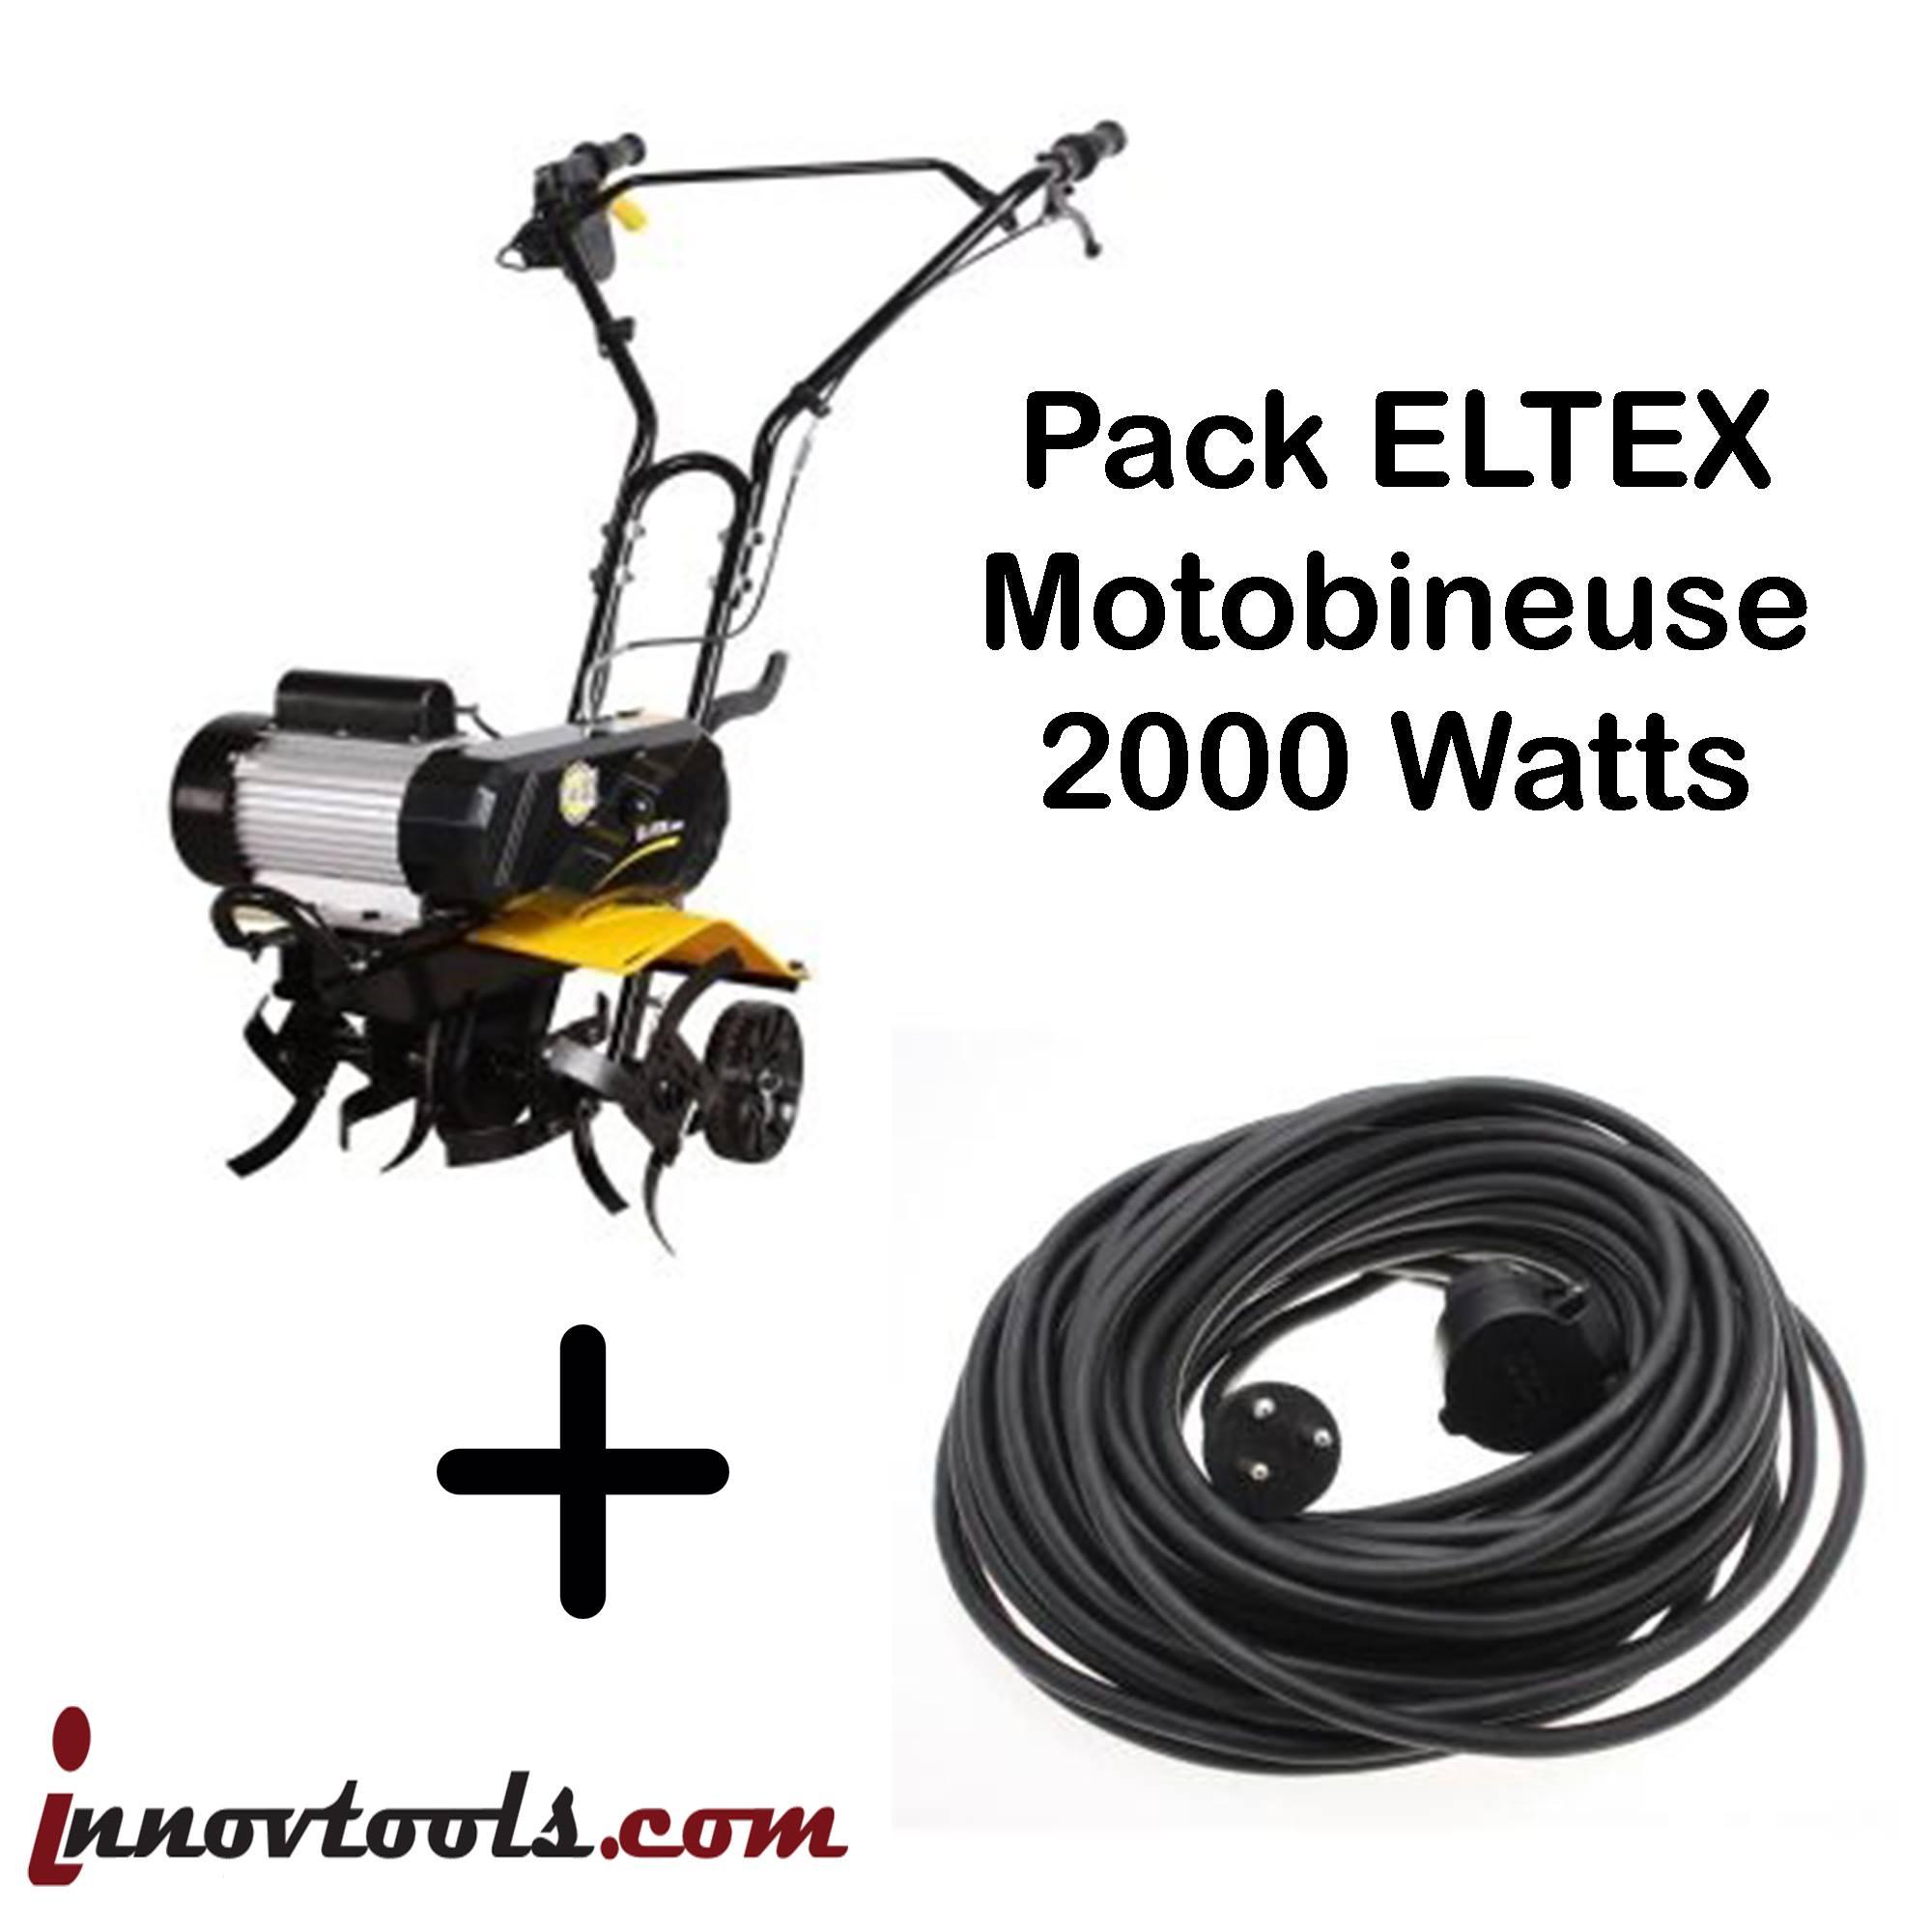 PACK Motobineuse ELTEX TEXAS 2000 + Rallonge 20 mètres